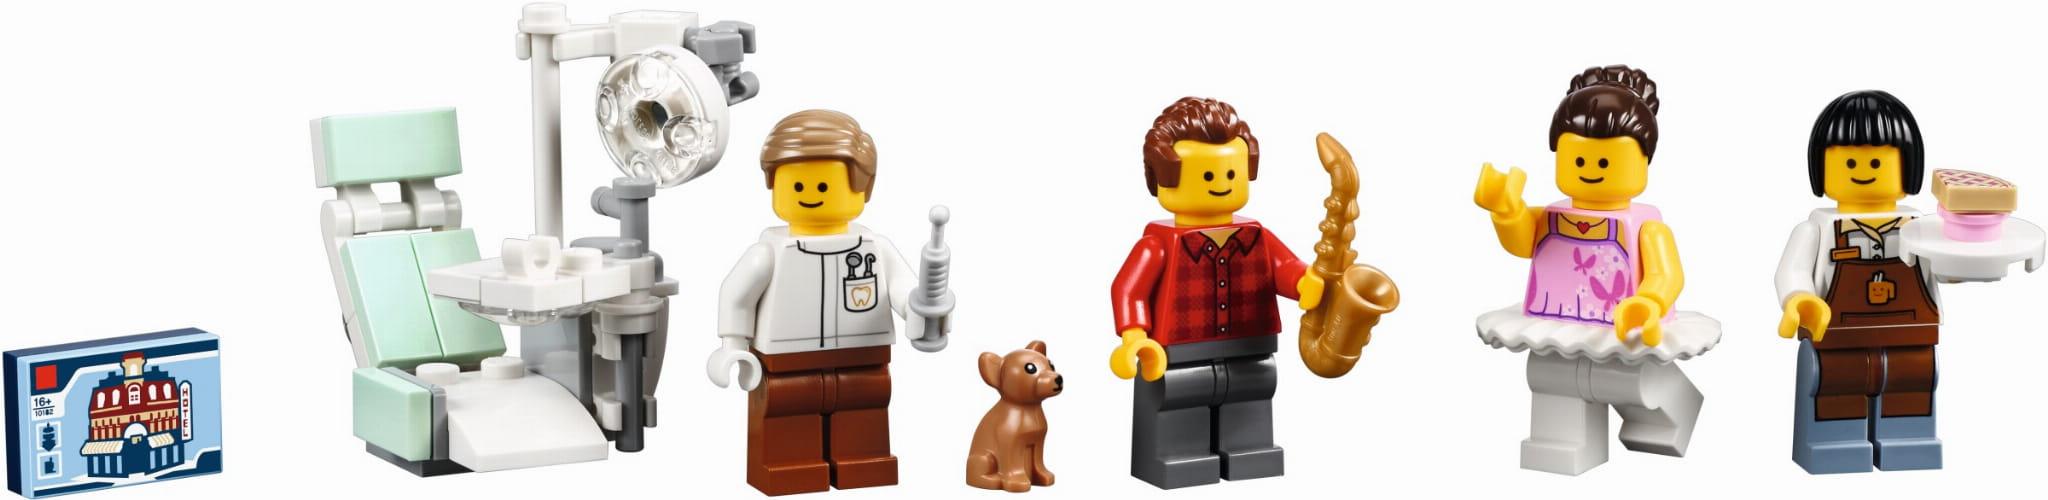 Klocki Lego 10255 Creator Plac Zgromadzeń Httpbricktoyspl